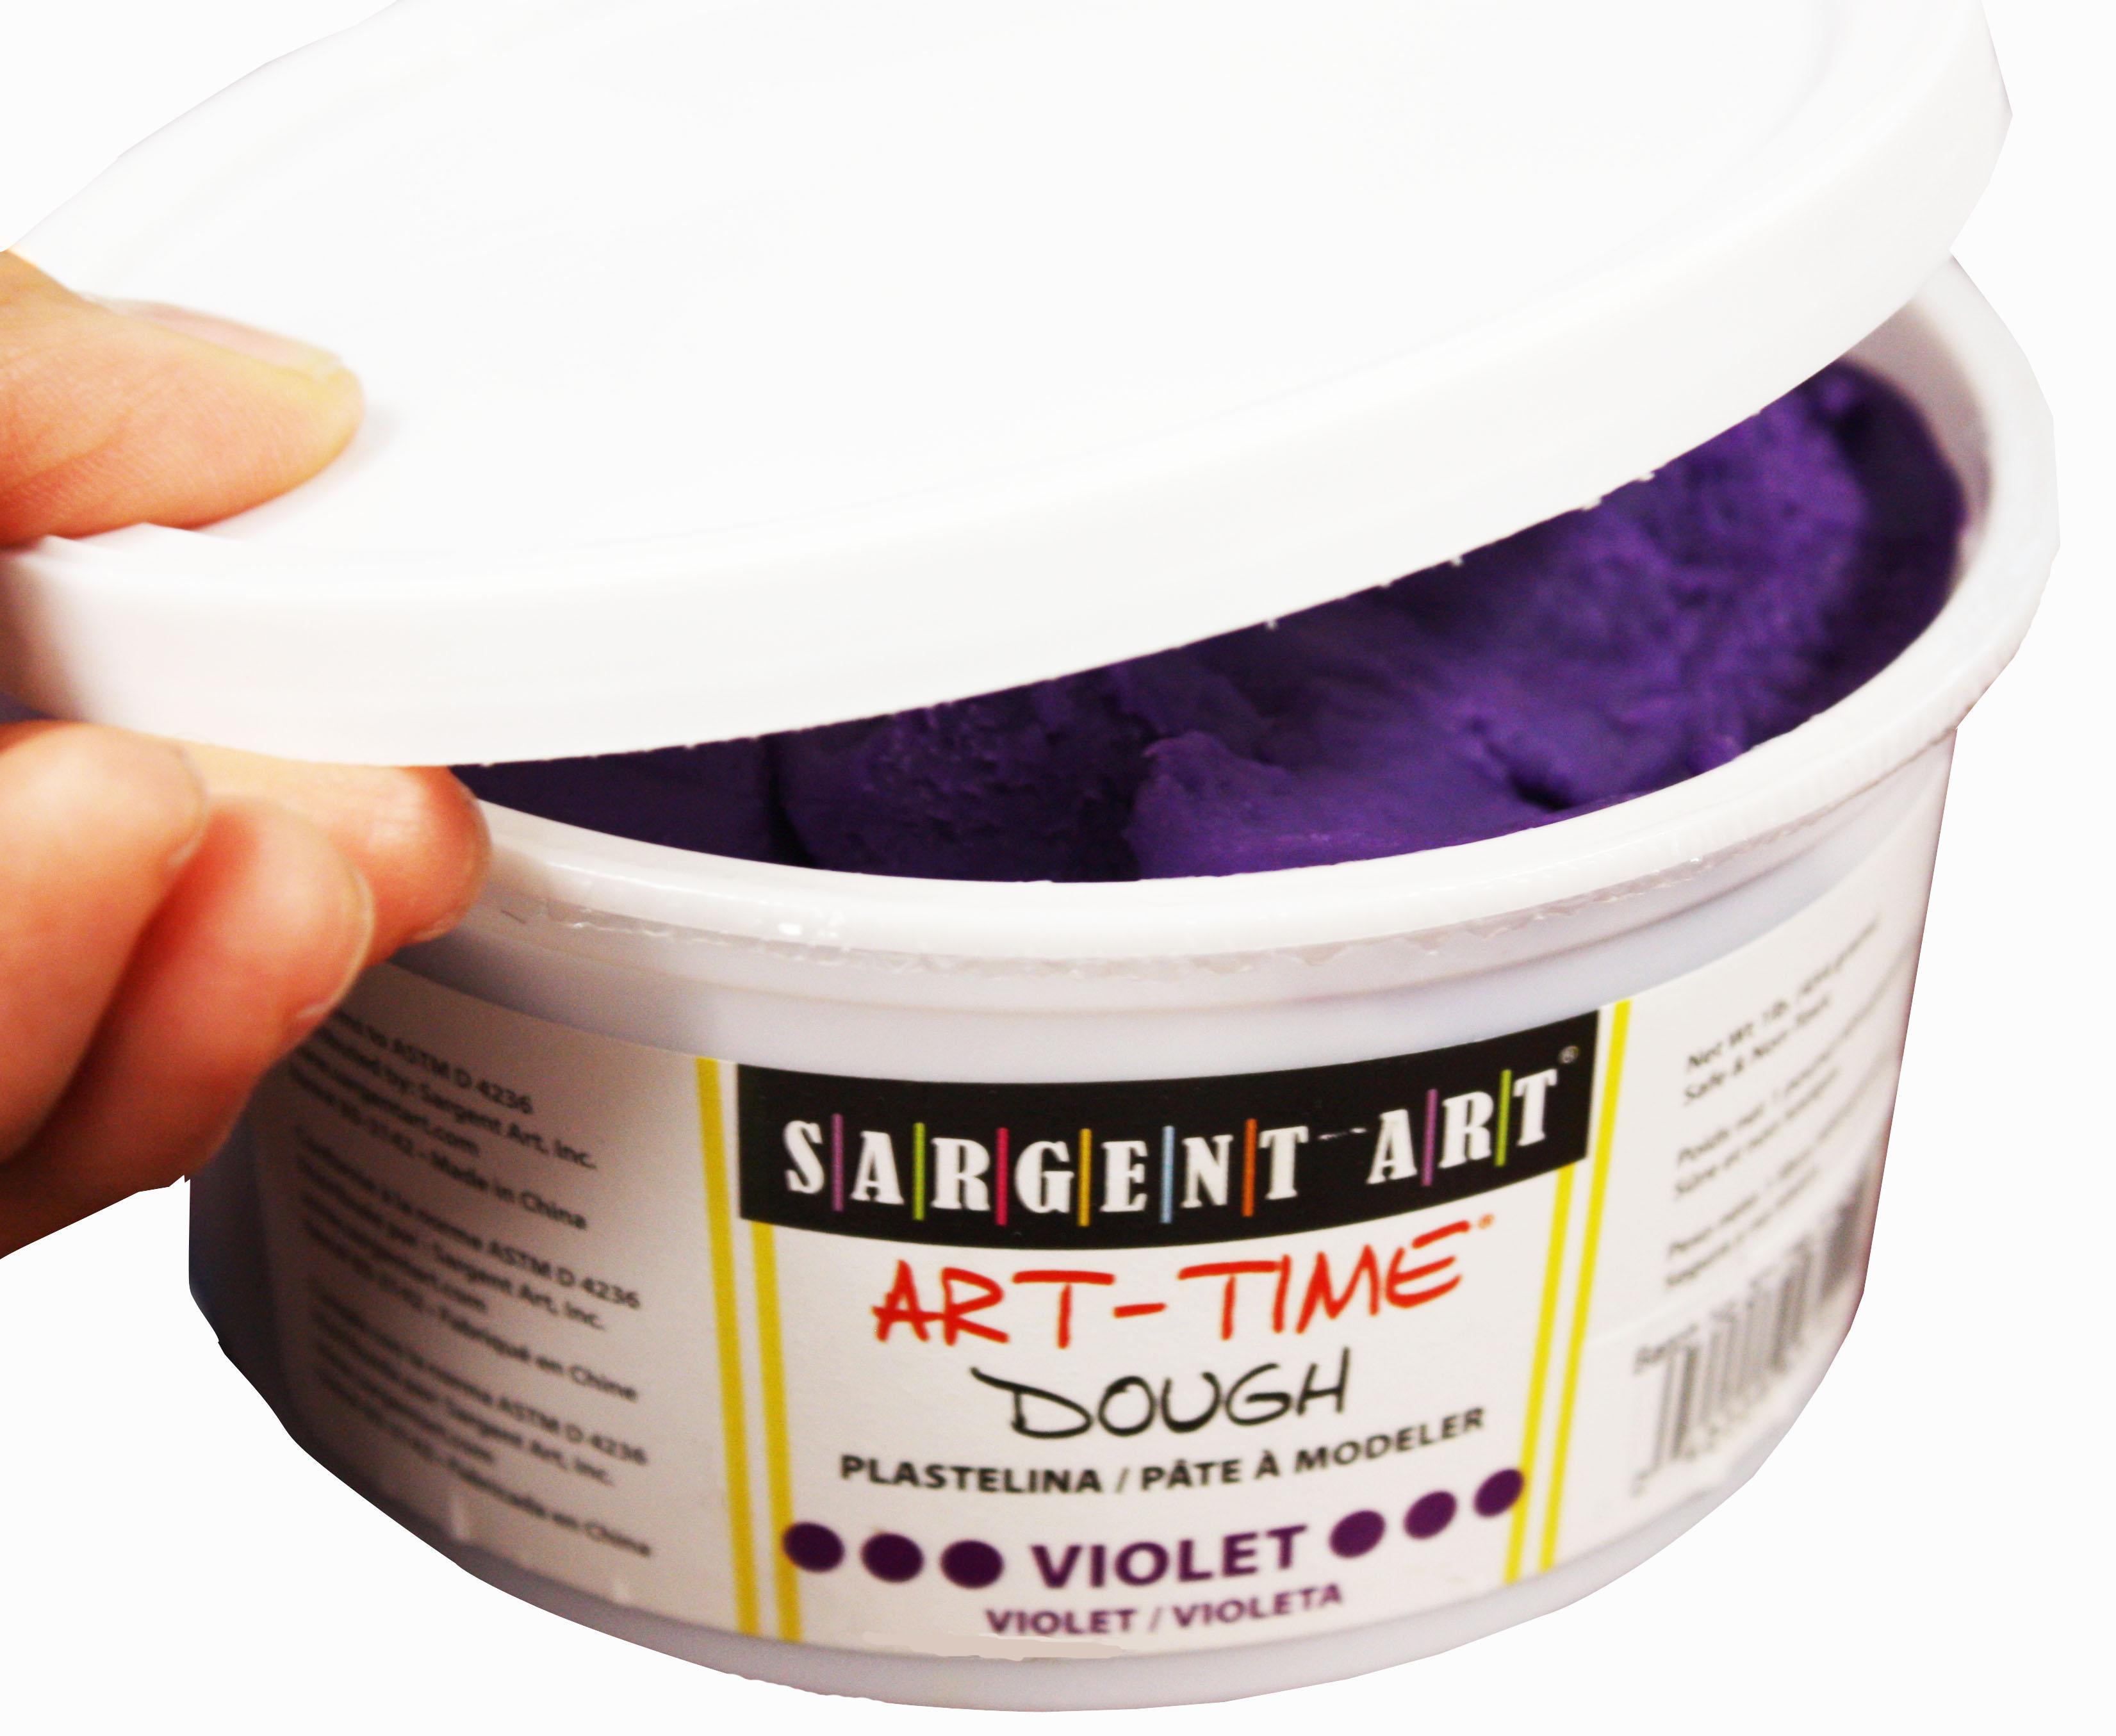 Pink Sargent Art 85-3329 3-Pound Art-Time Dough